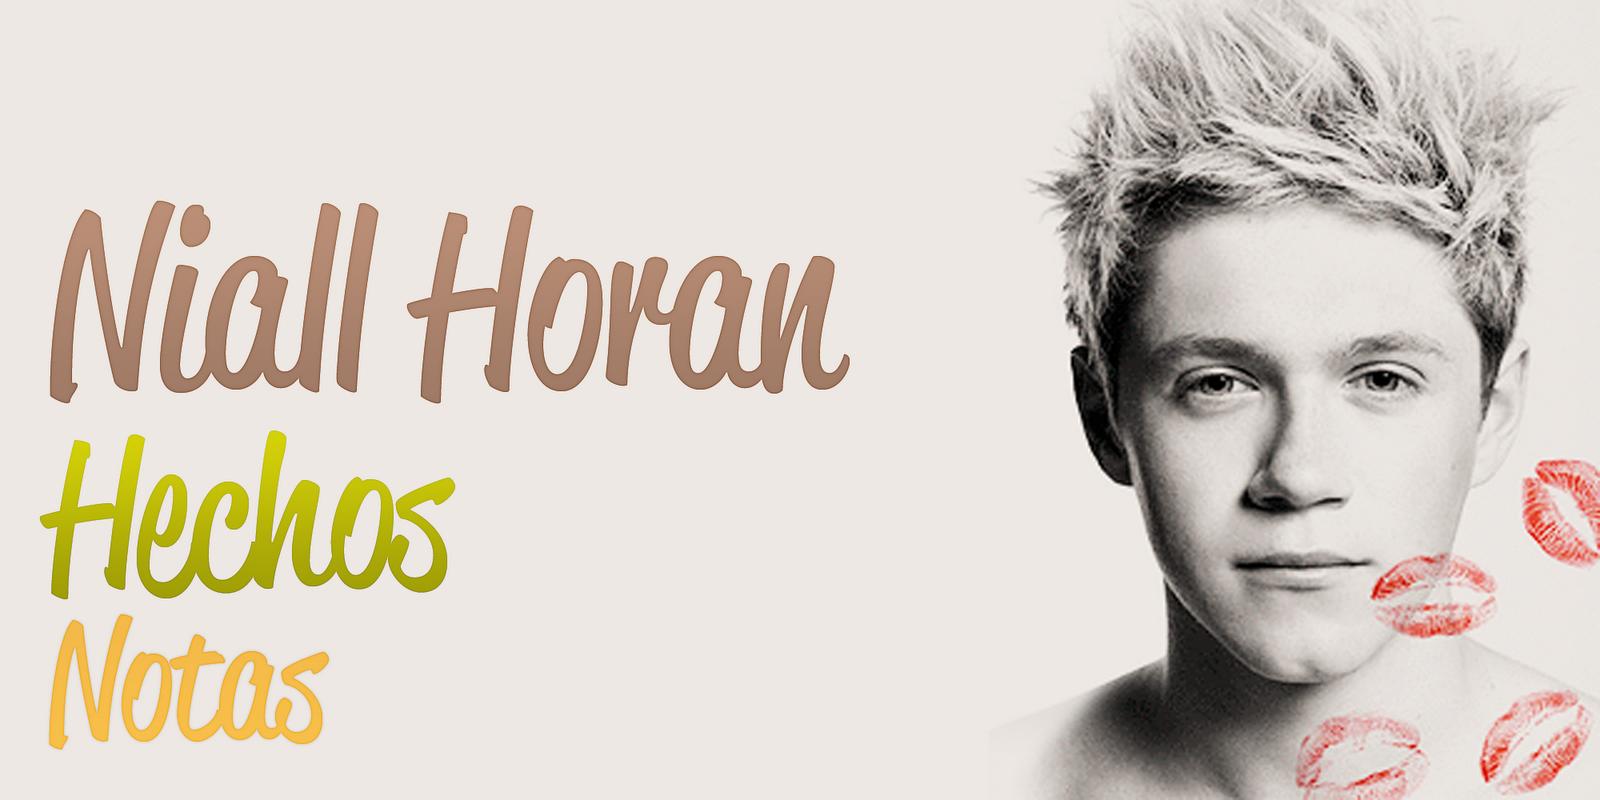 Niall Horan Hechos